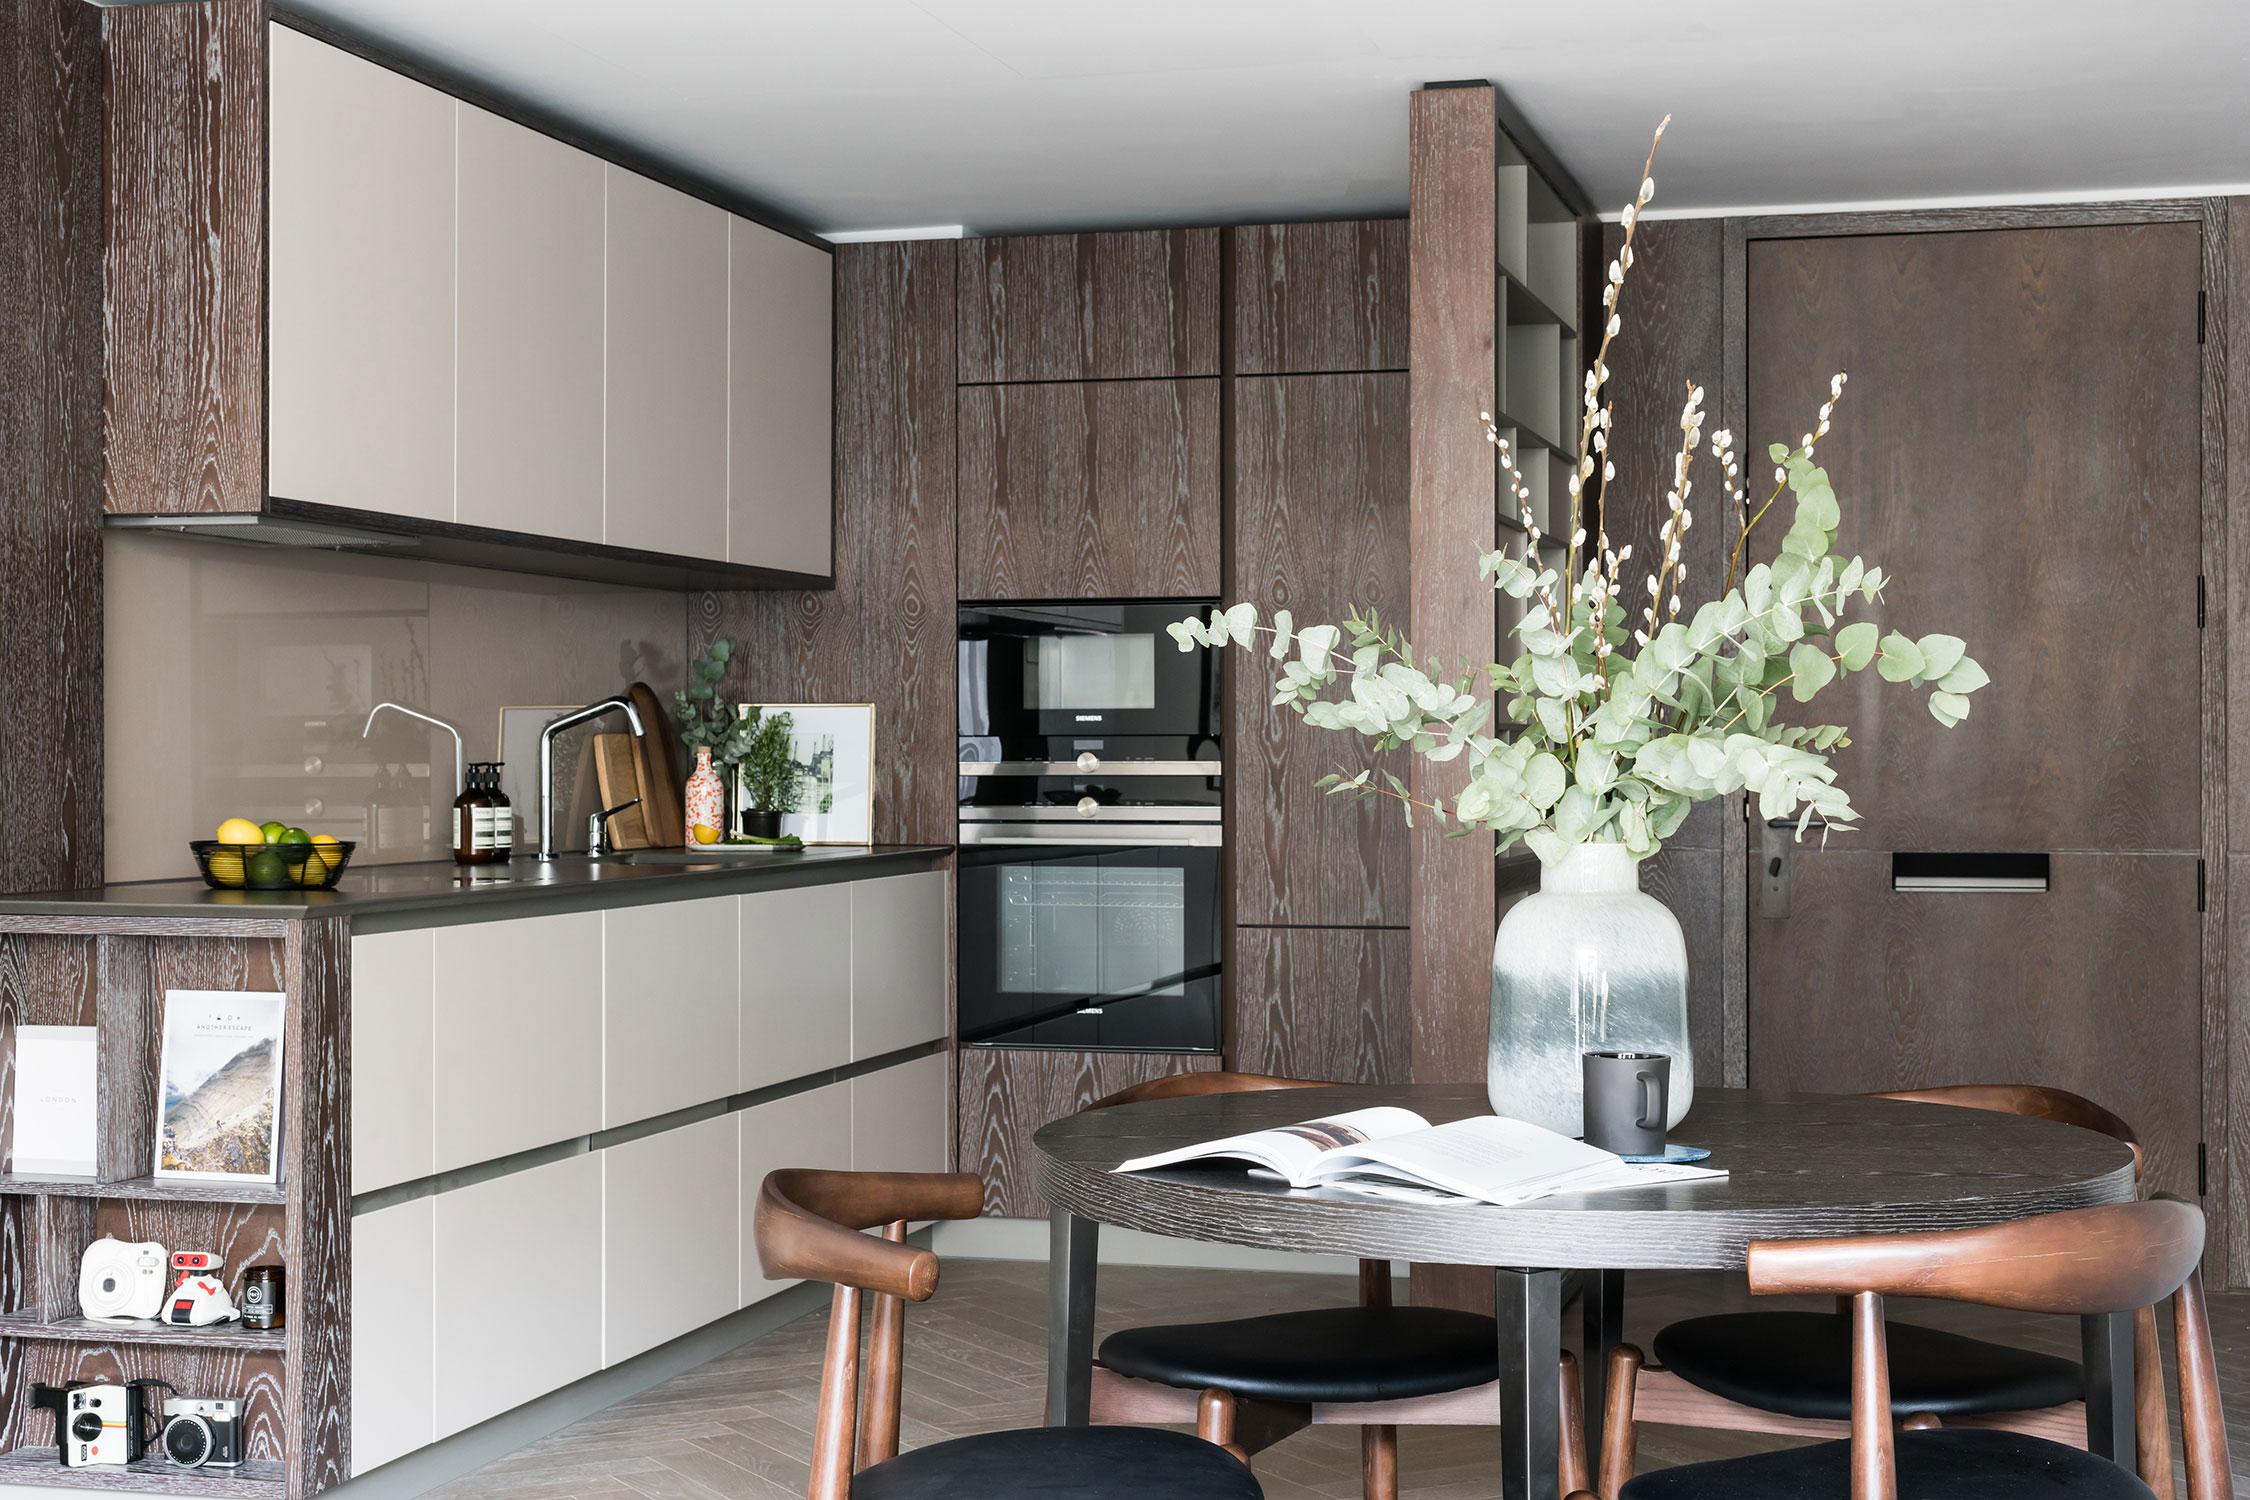 BoxNine7_Battersea_Power_Station_14_Kitchen_Dining_Room.jpg